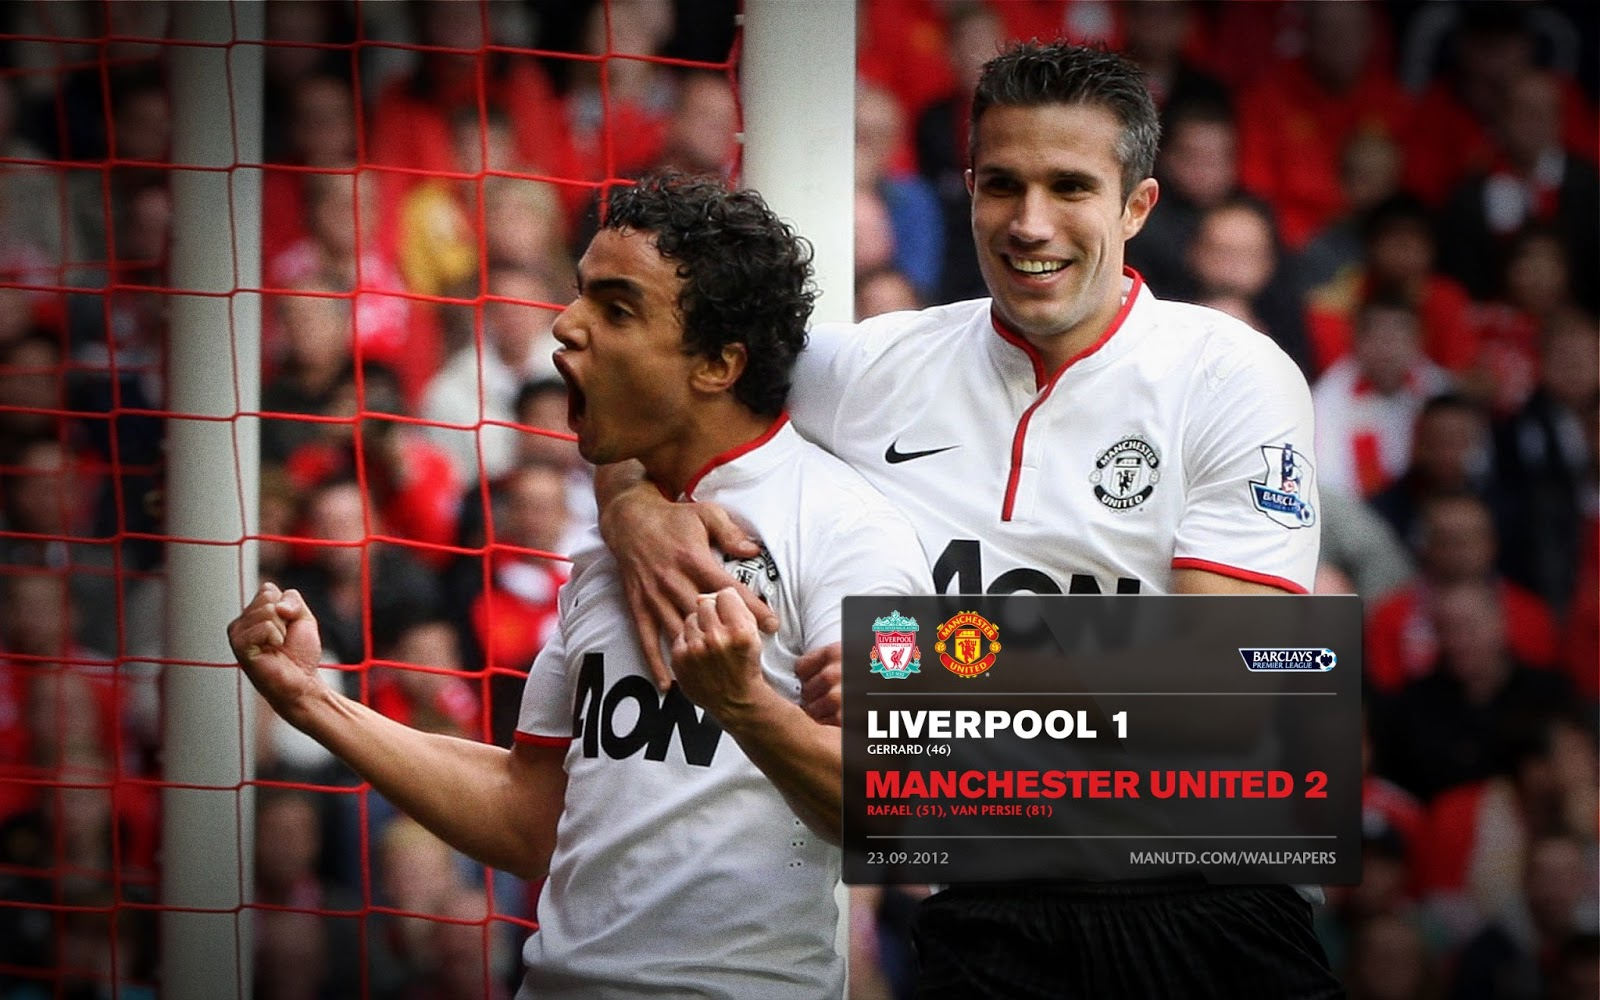 http://3.bp.blogspot.com/-mS1BE8ms9mo/UT8I-C_rgPI/AAAAAAAALFE/DY4DMjZO4b0/s1600/Match_Liverpool_A.jpg